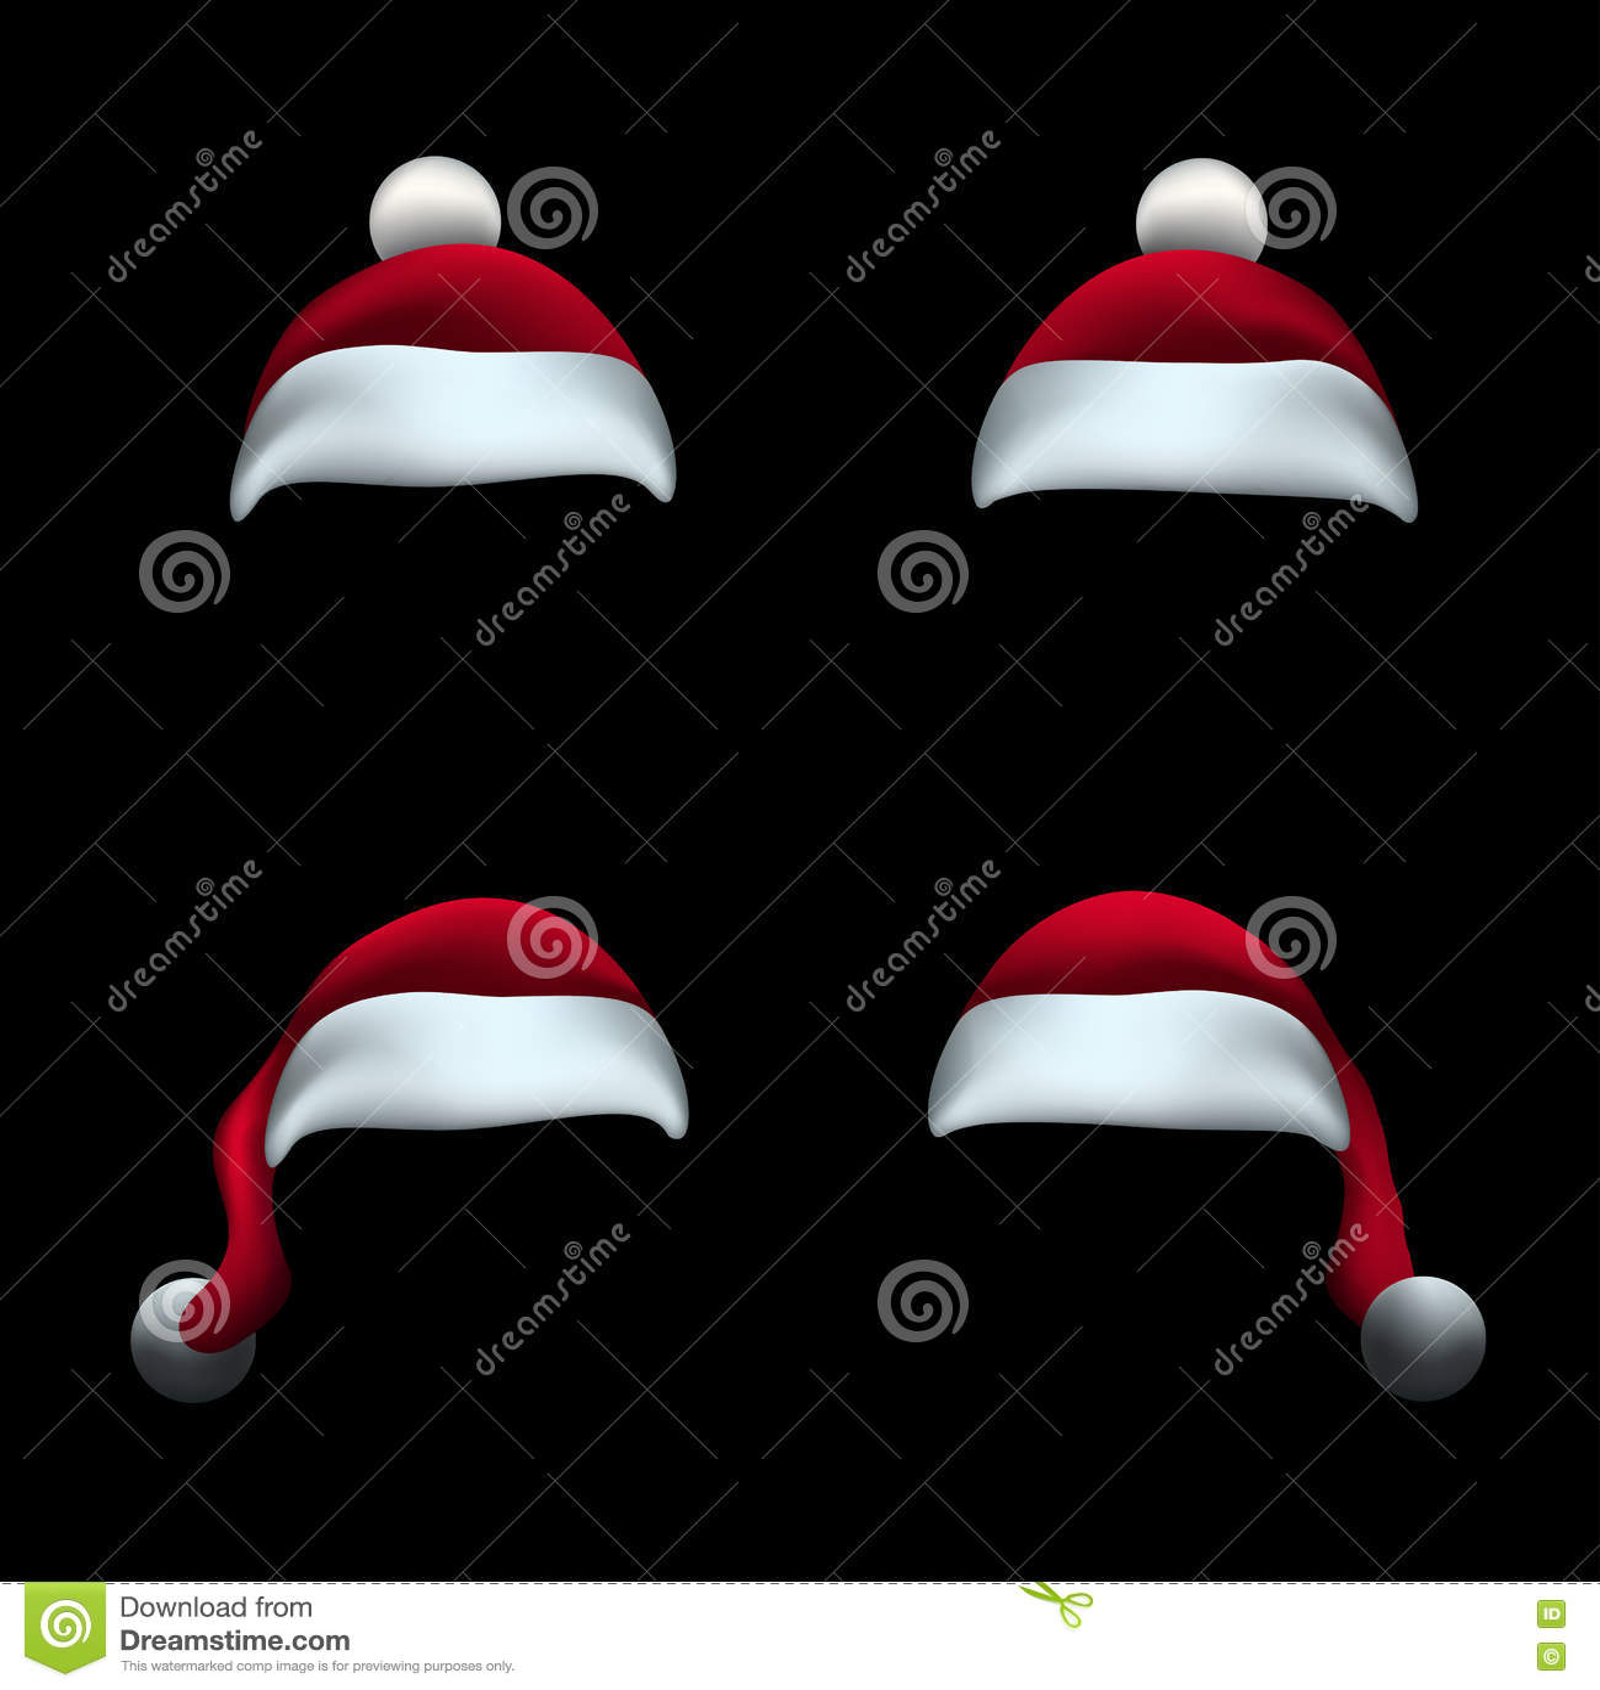 Santa hat black background stock vector. Illustration of headdress ...